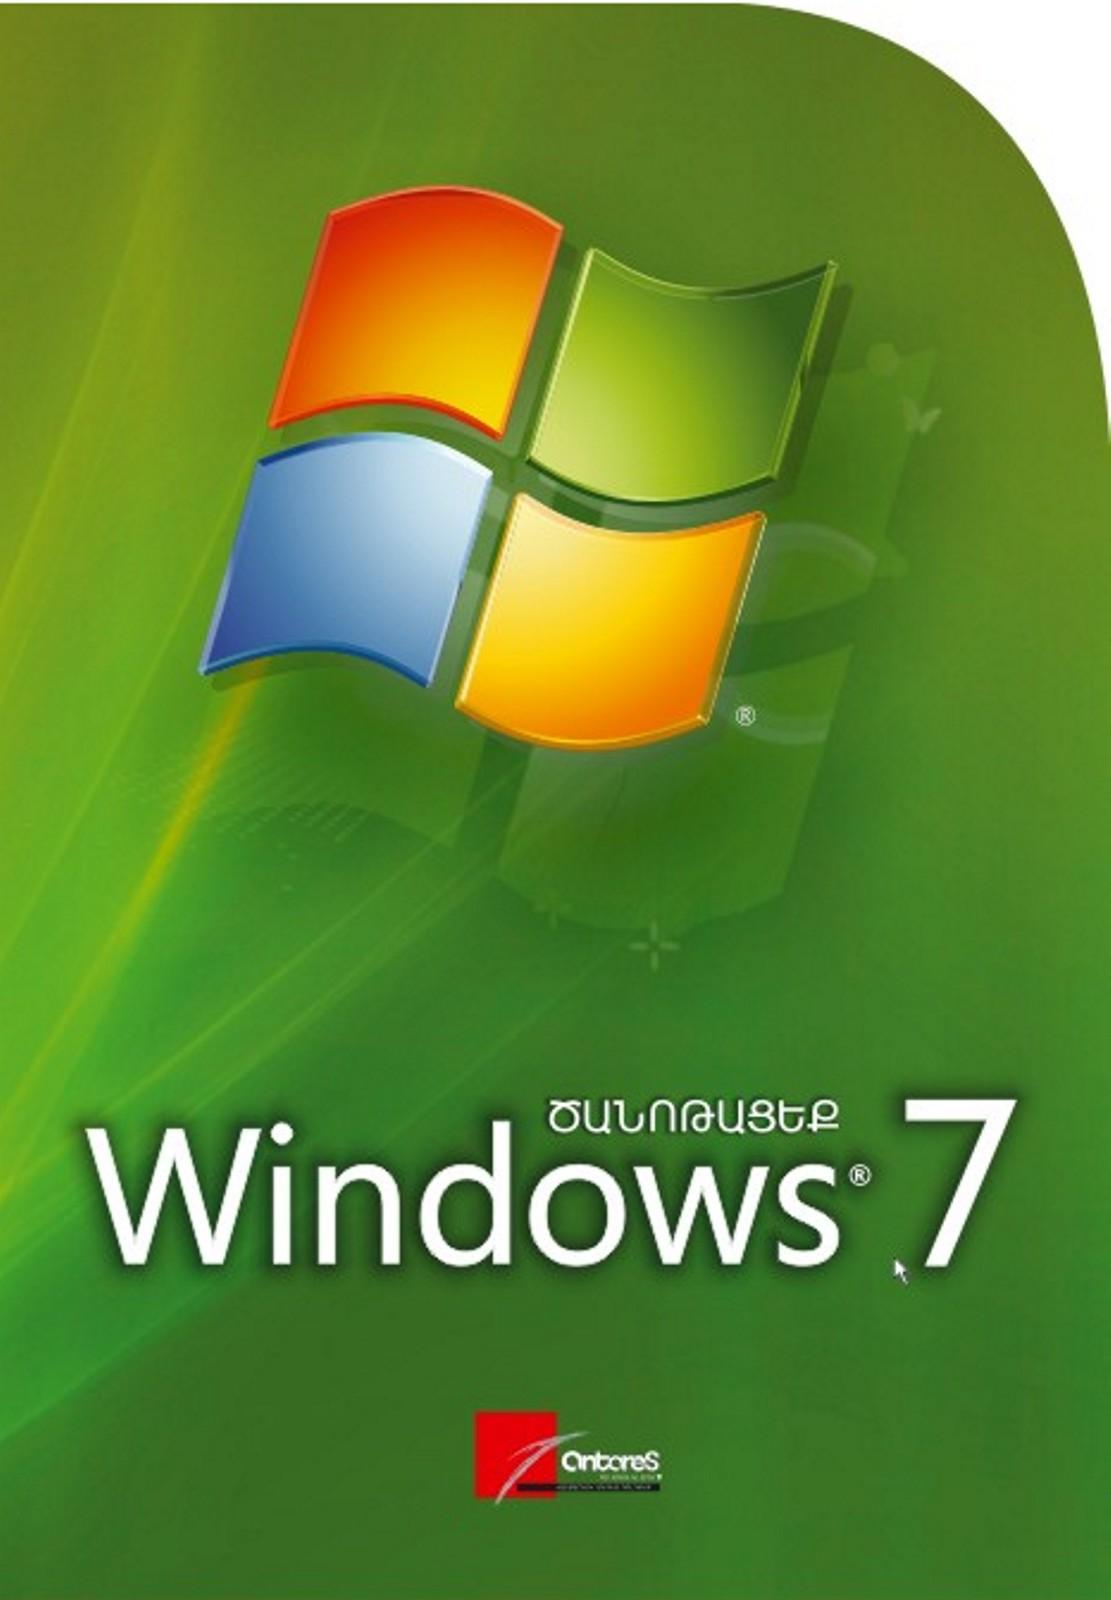 Windows знакомство 7 в